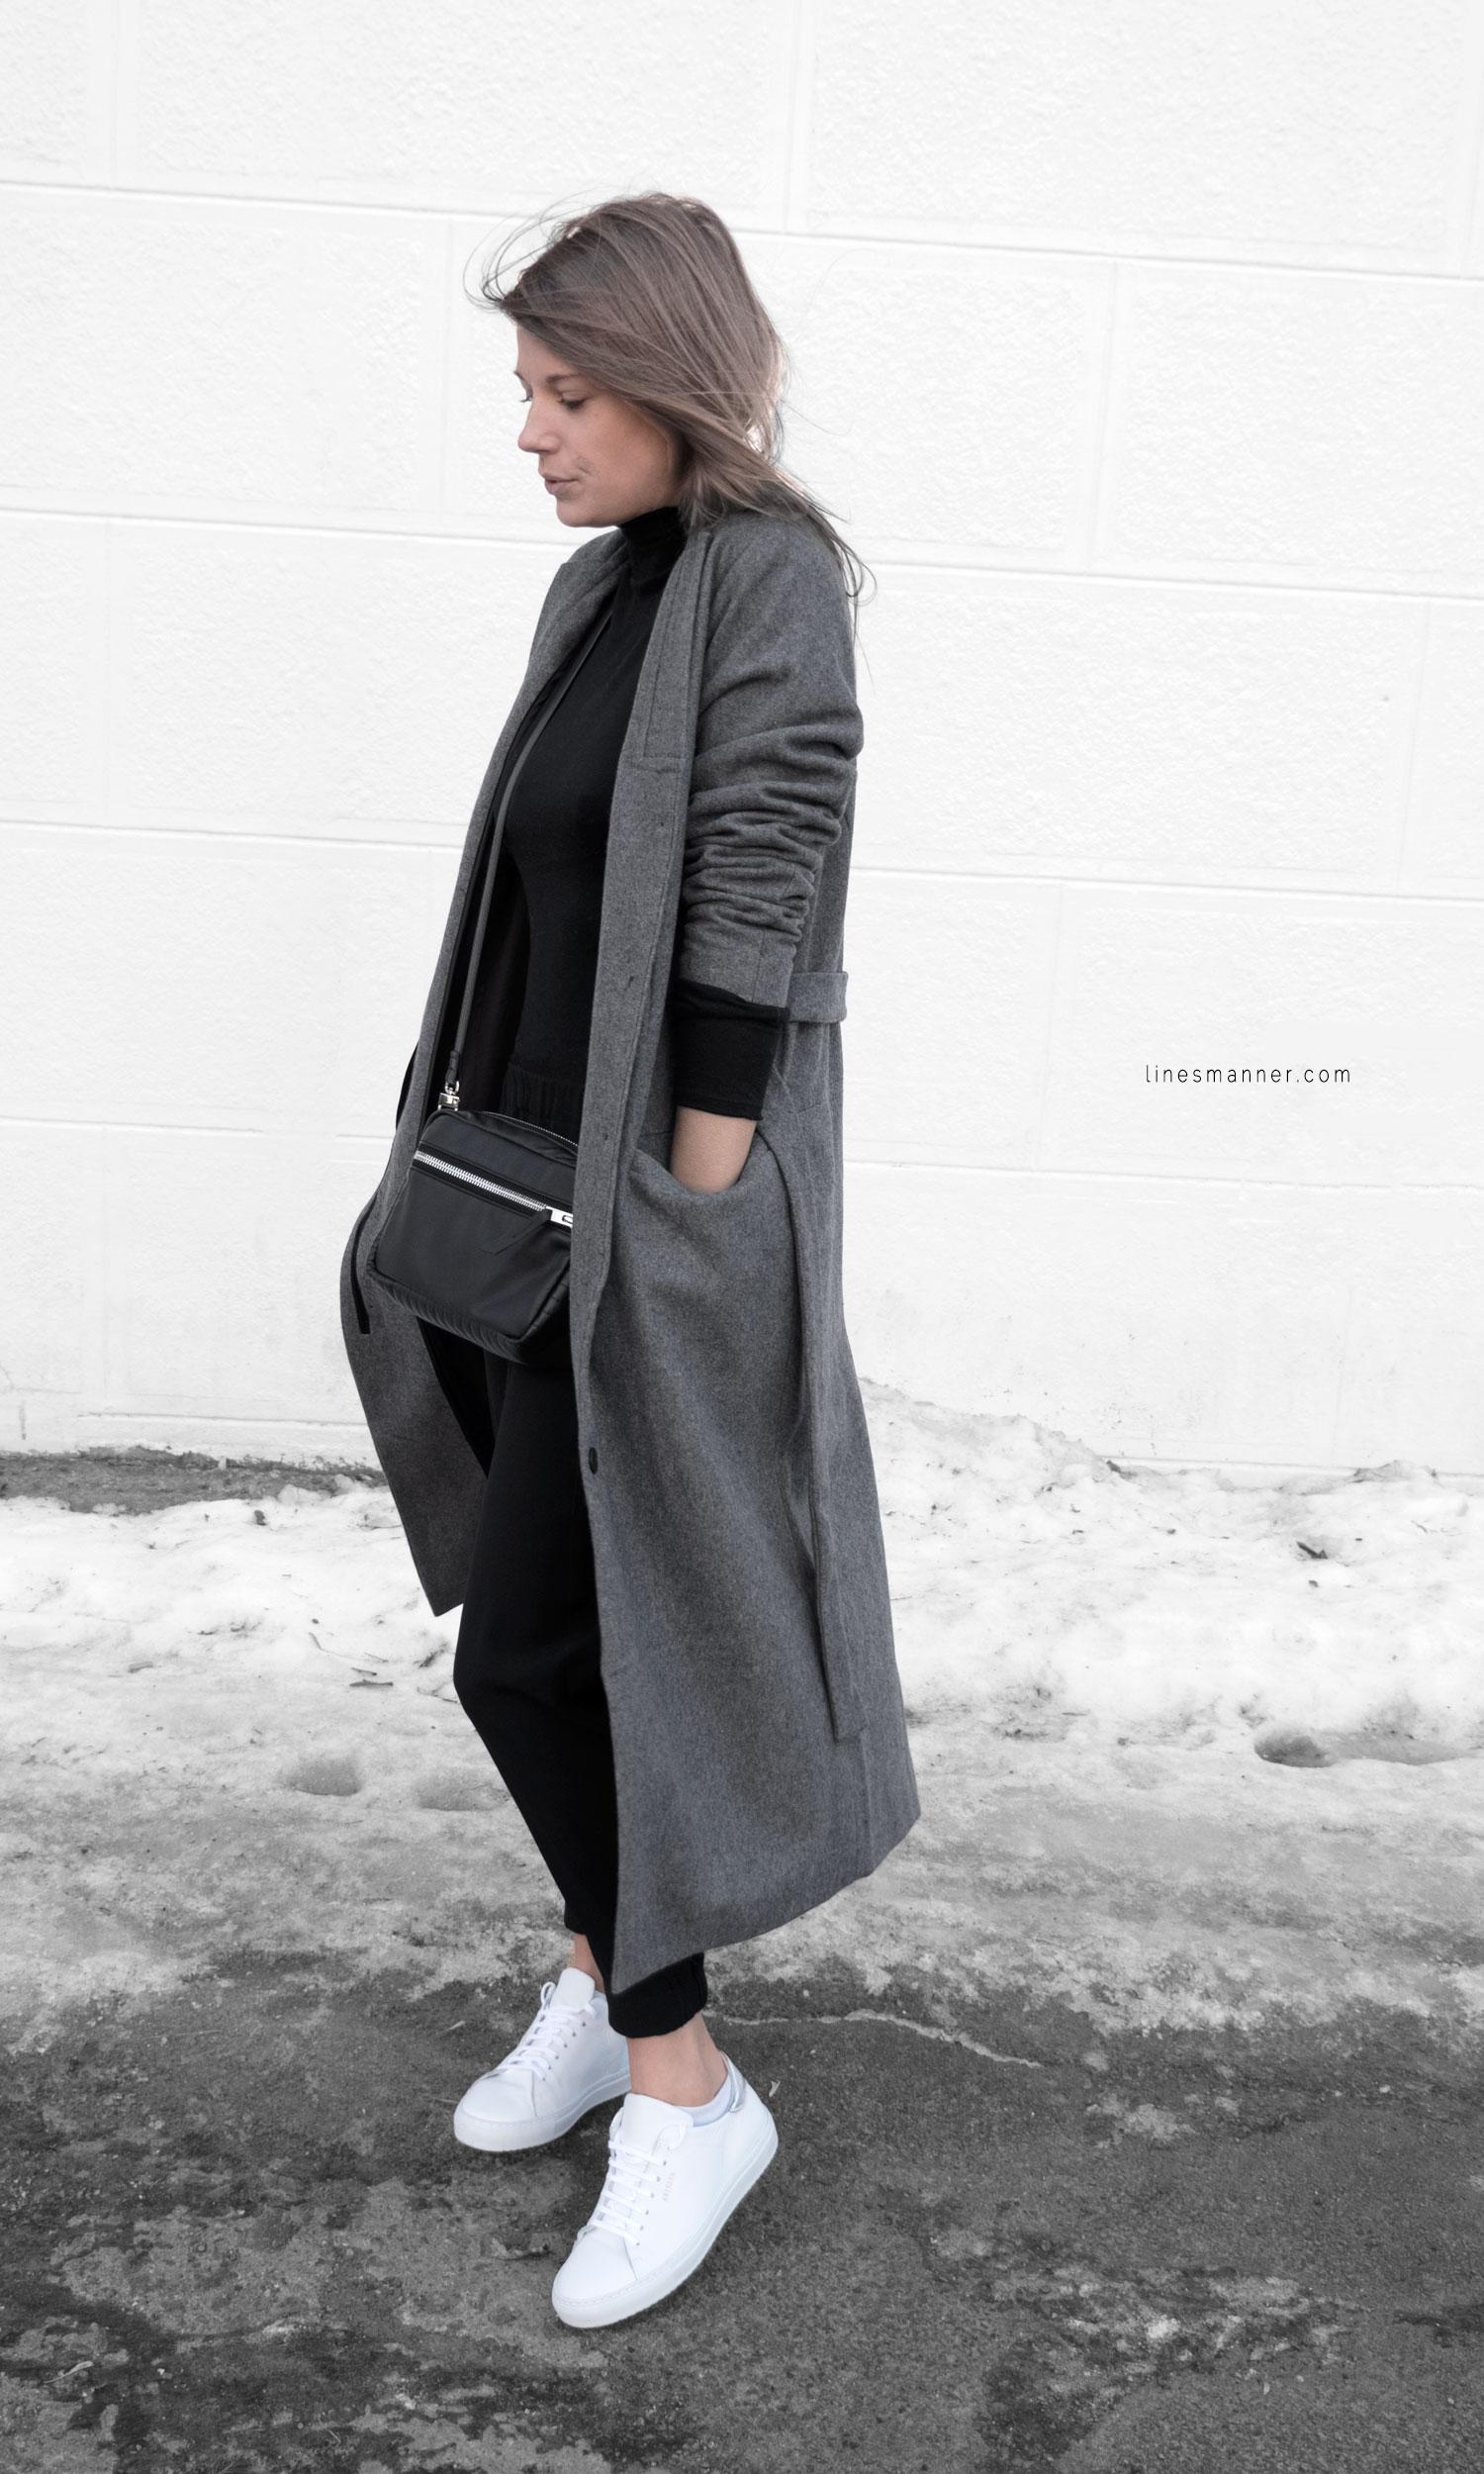 Lines-Manner-Simplicity-Neutral-Palette-Functional-Versatile-Timeless-Grey-Winter_Coat-Details-Essentials-Minimal-Basics-3